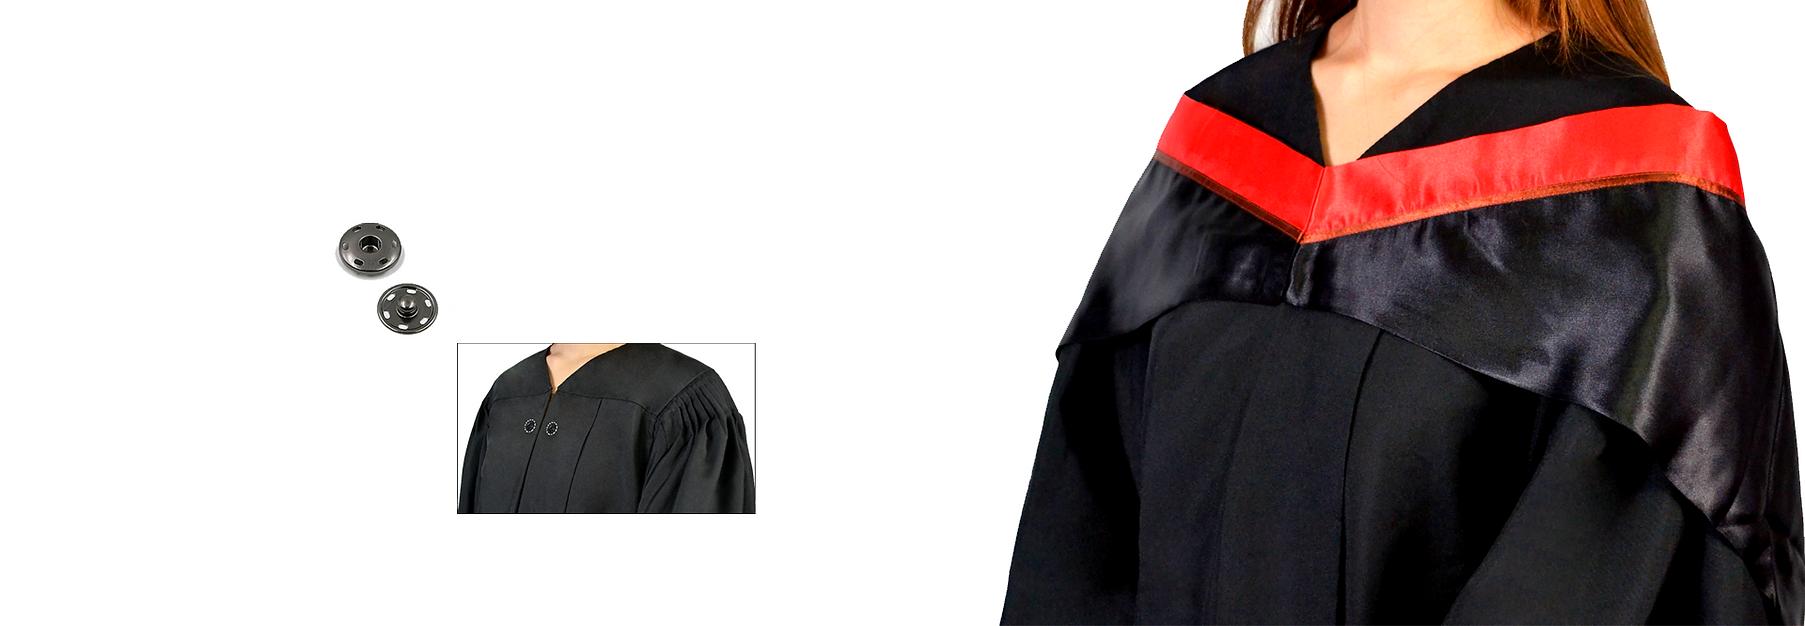 理工大學畢業袍 | 理工大學畢業袍 | 理大畢業袍  The Hong Kong Polytechnic University ( PolyU ) Graduation Gown | Academic Dress and Academic Regalia | Rent or Buy 租借、購買香港理工大學畢業袍 | 理工大學畢業袍 | 理大畢業袍 | 學士畢業袍、碩士畢業袍、博士袍畢業袍